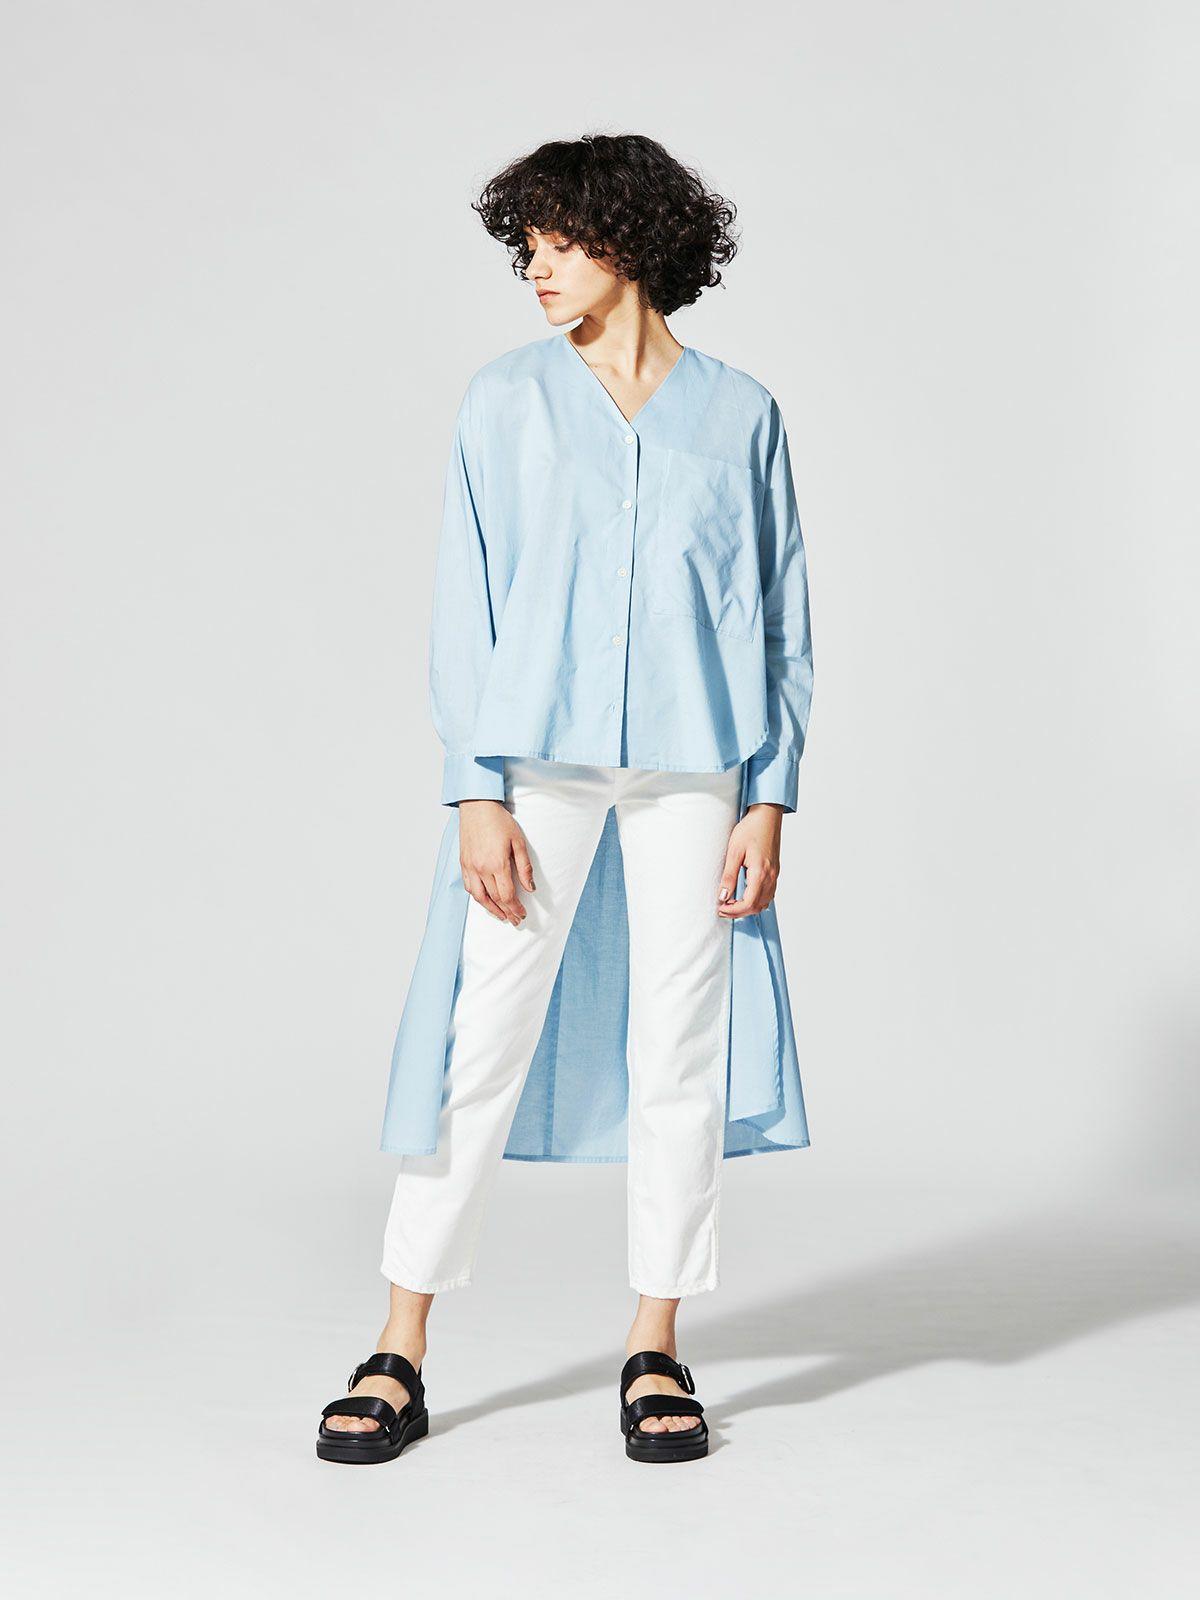 MIDIUMISOLID for Ladies イレギュラーレングスシャツ